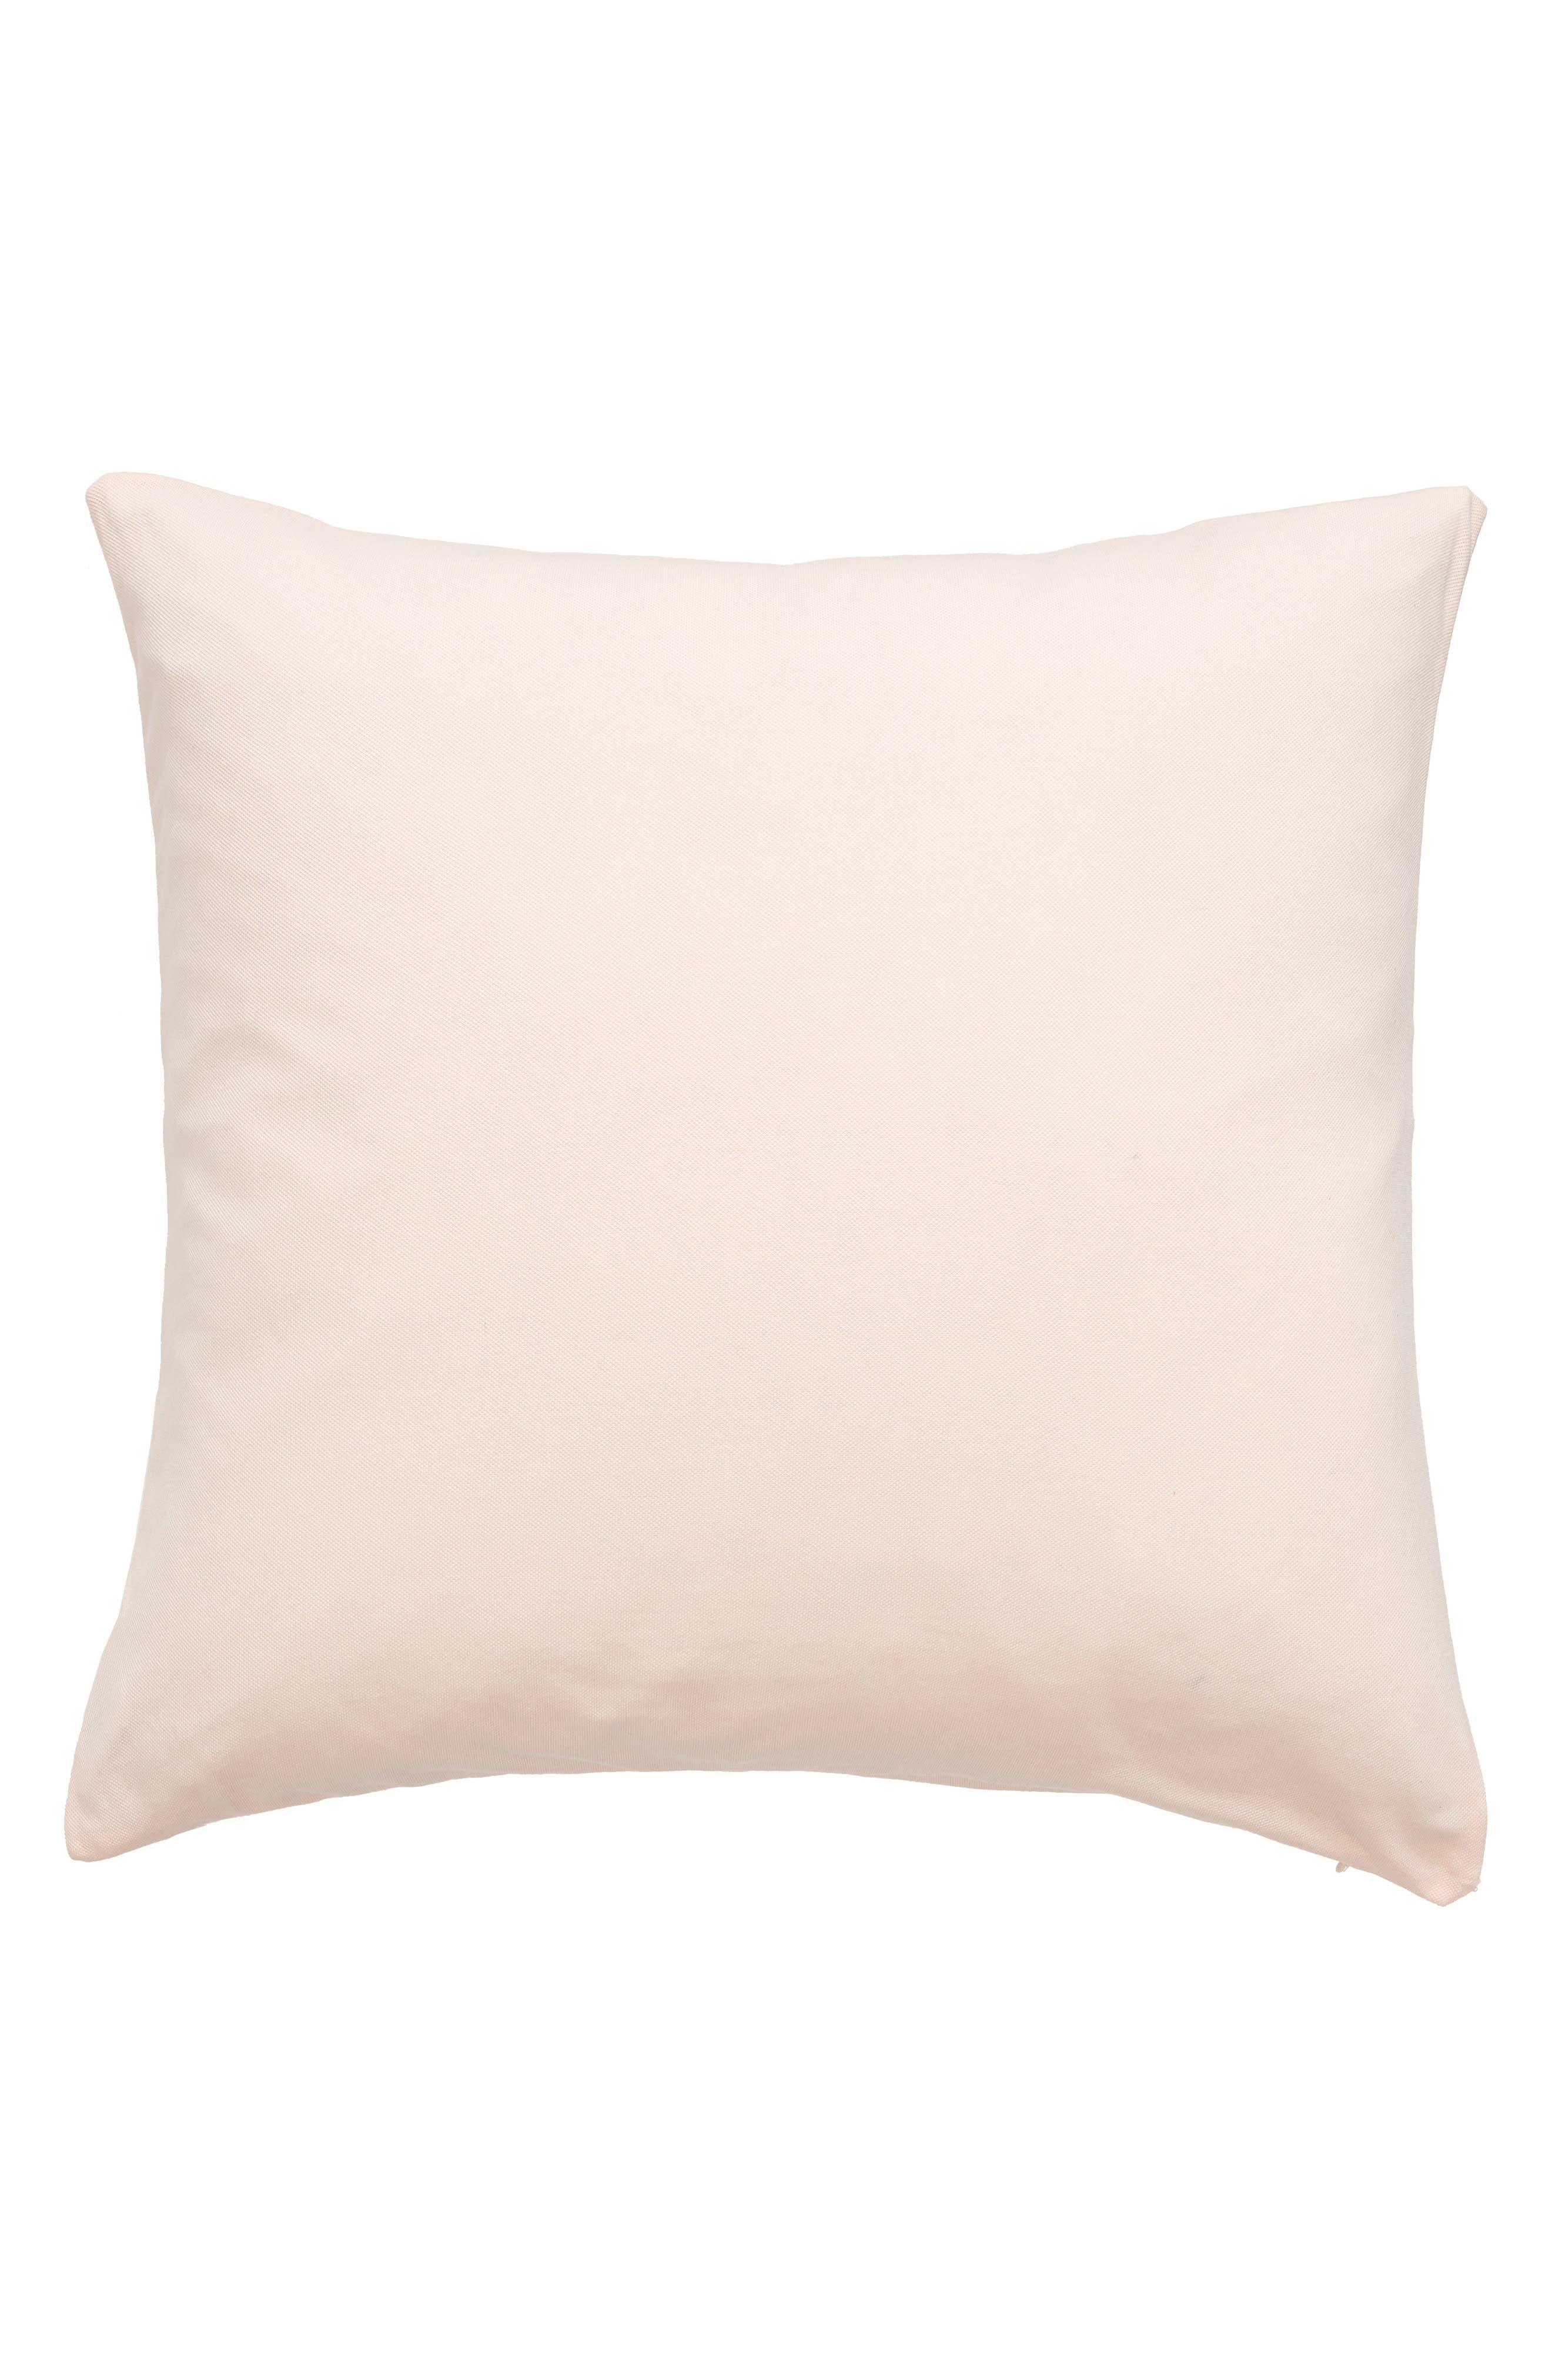 Home Jacob Accent Pillow,                         Main,                         color, Pink